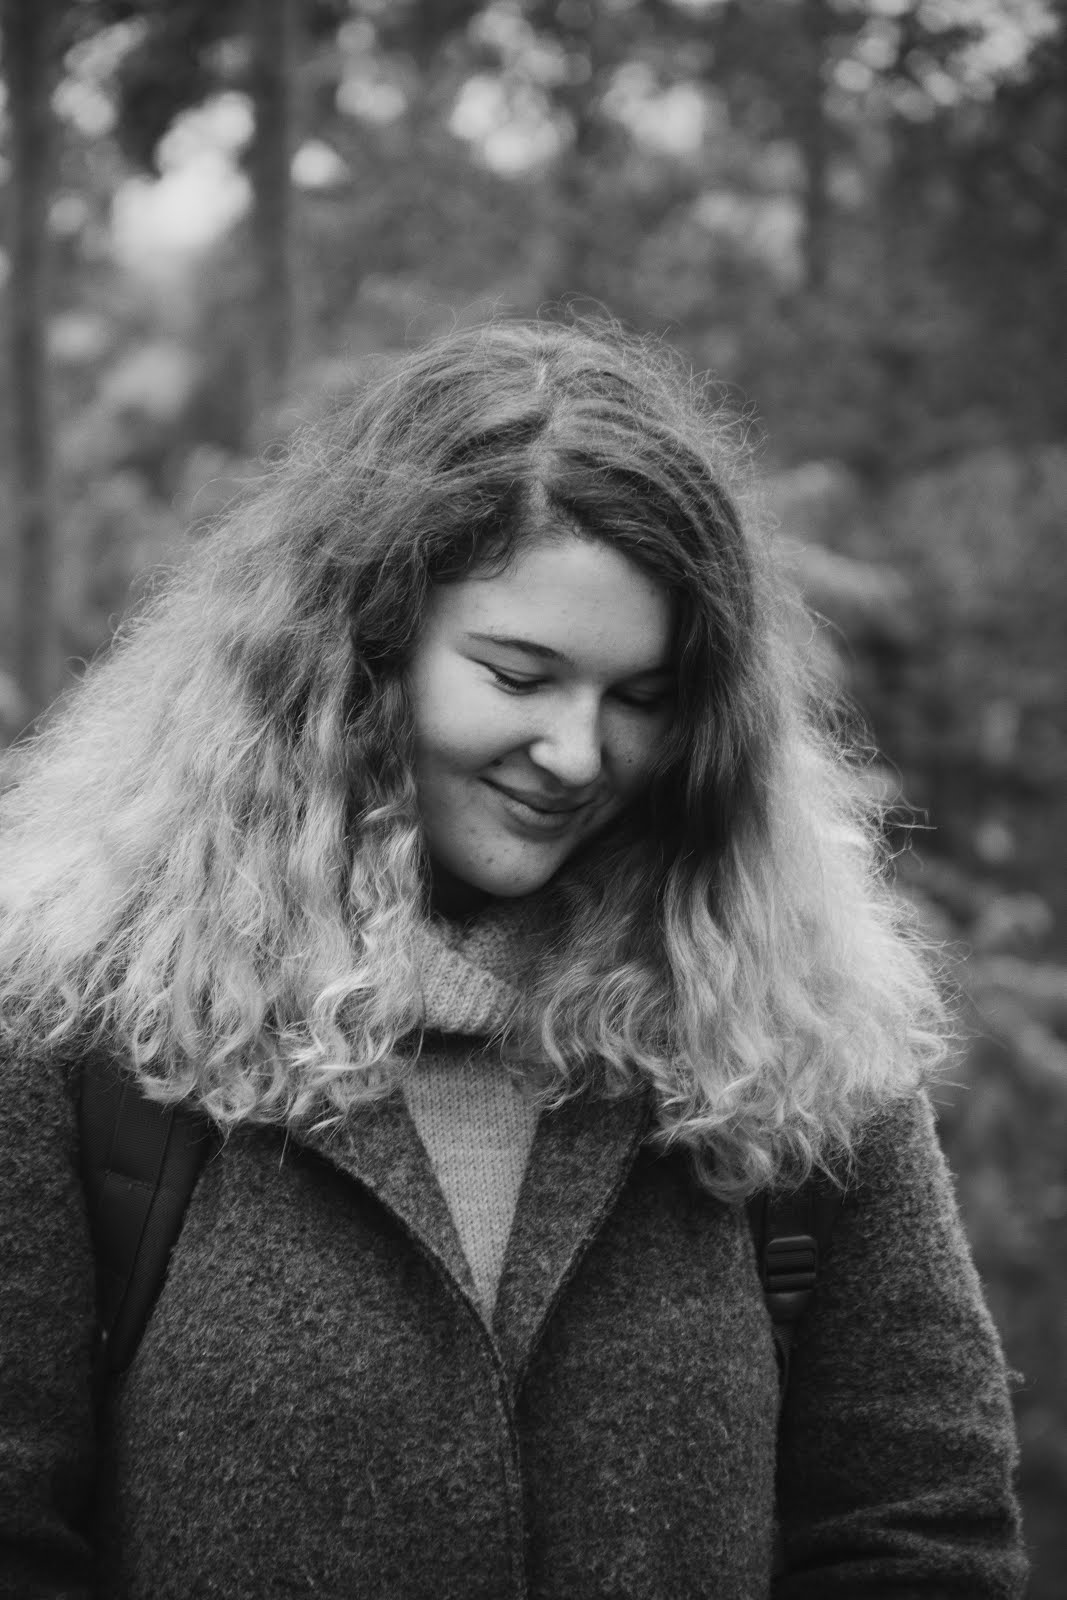 Anna | 19